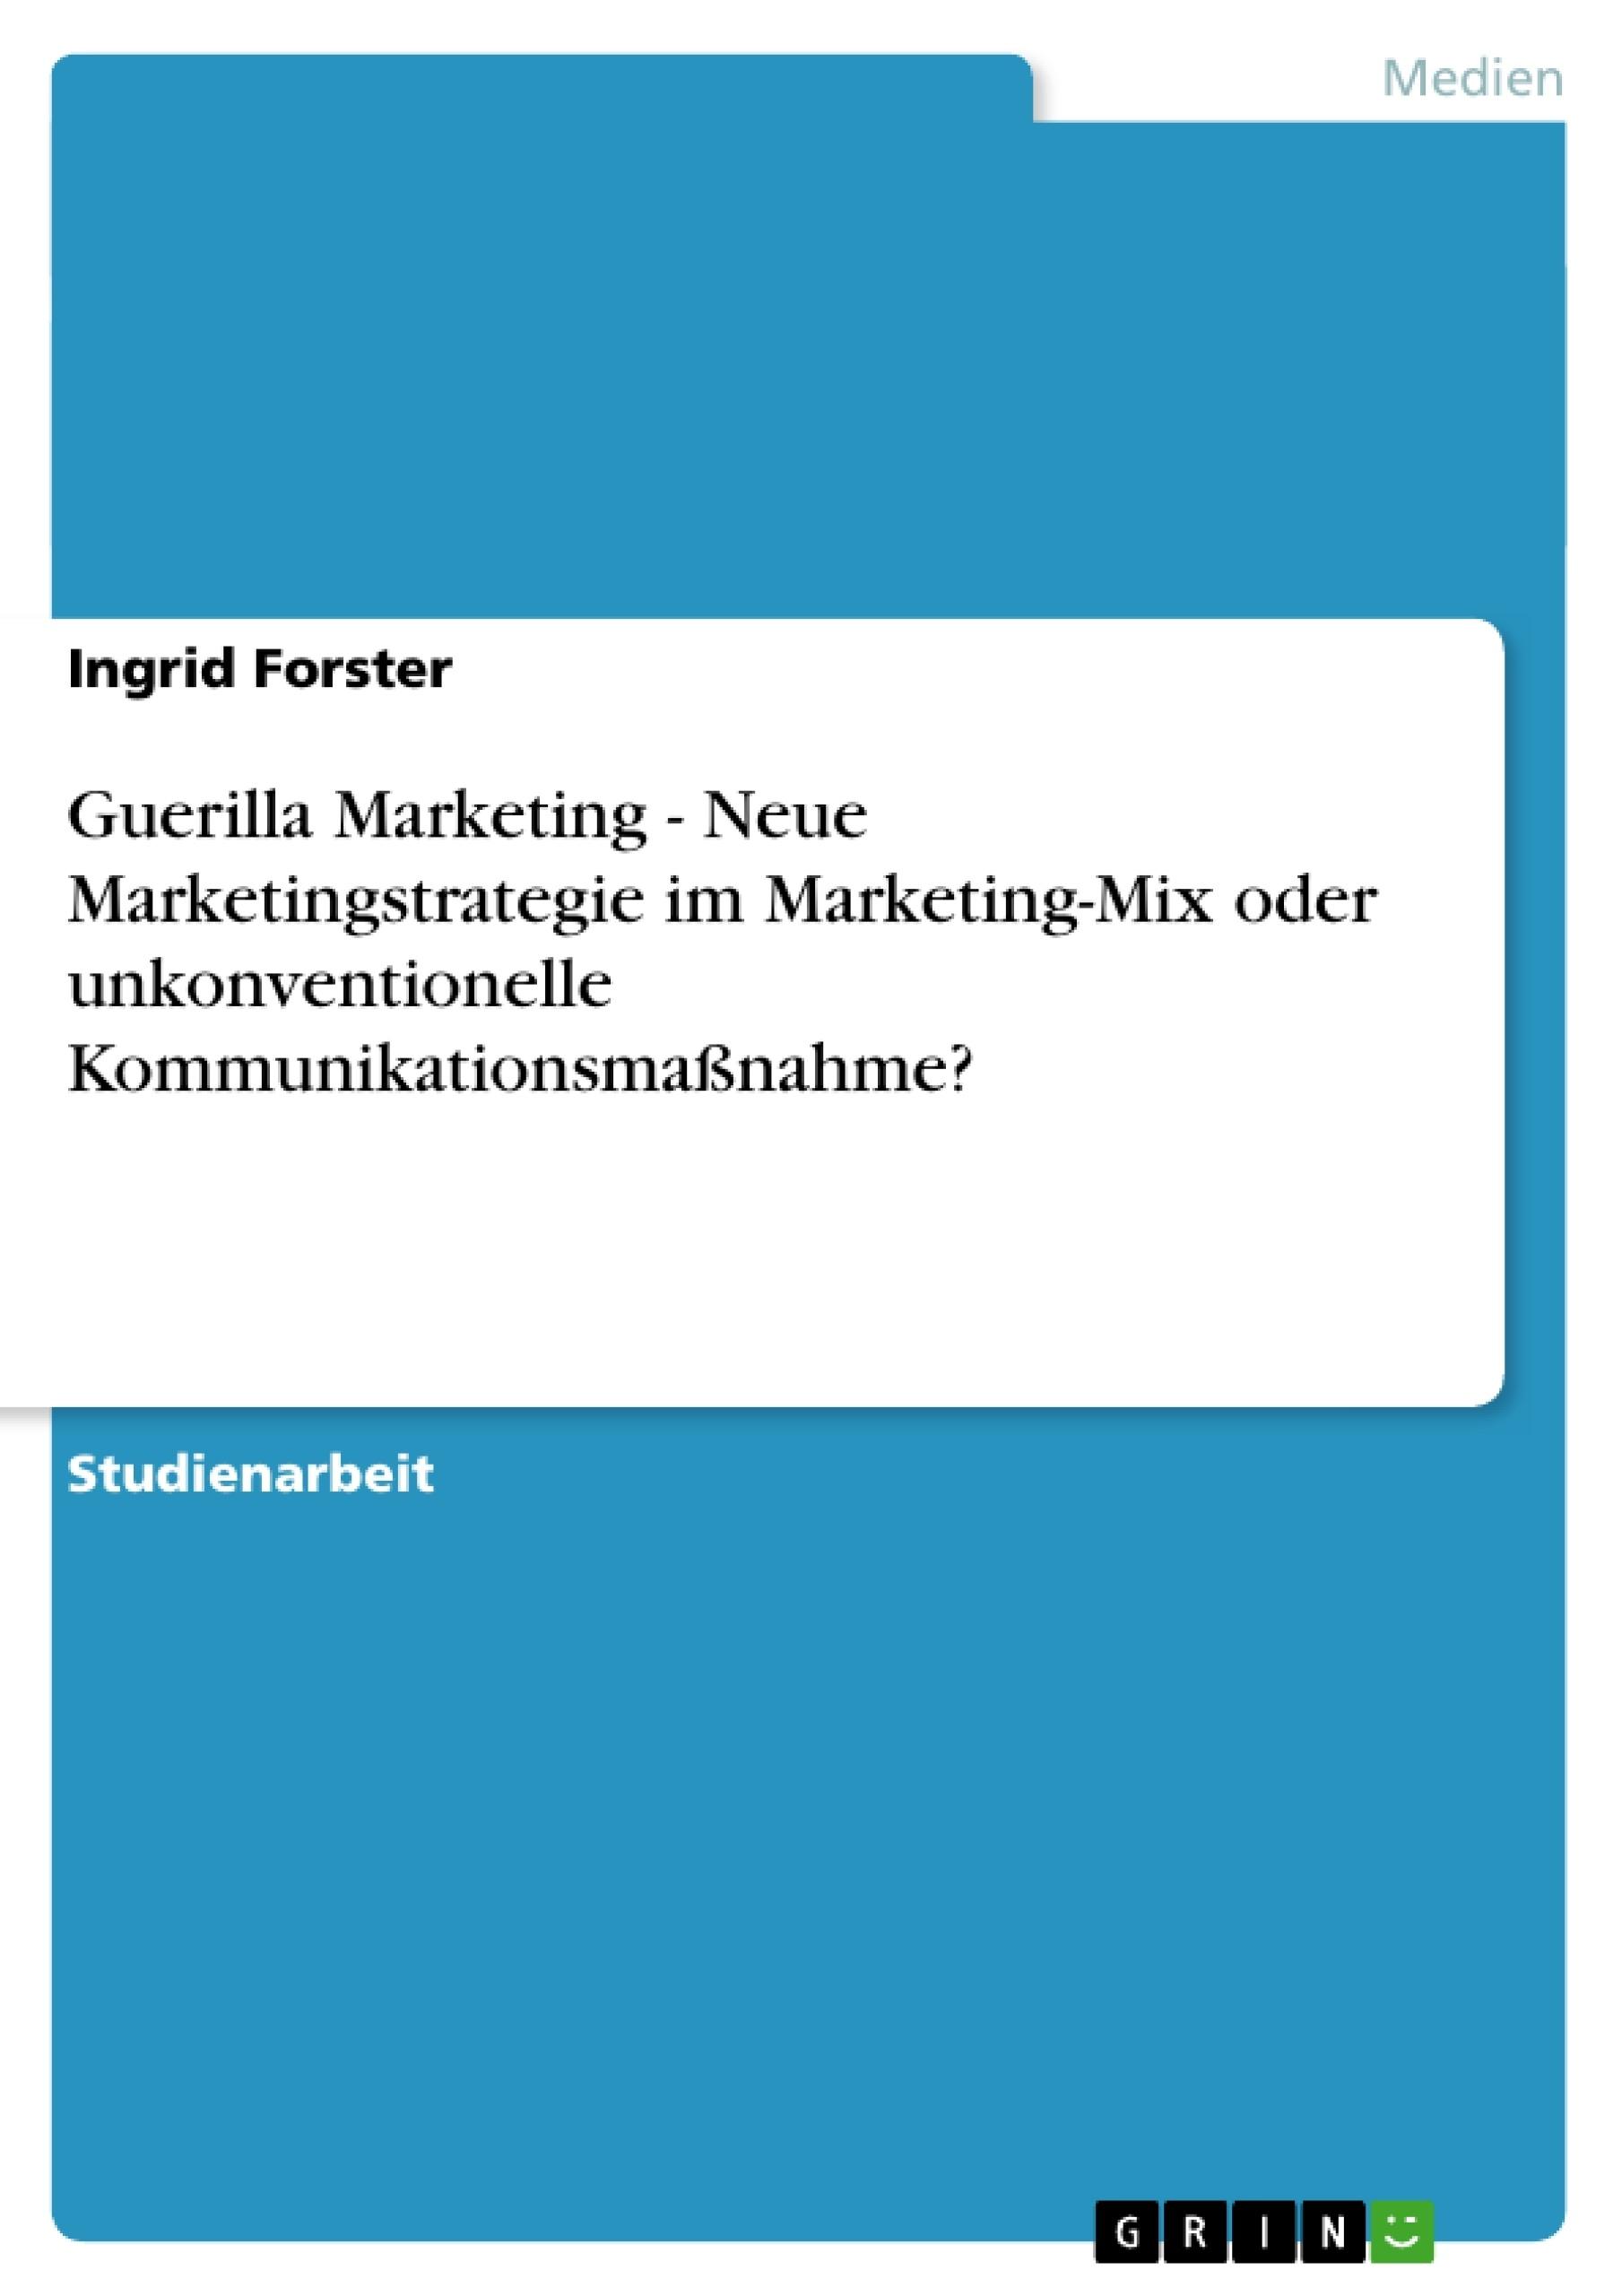 Titel: Guerilla Marketing - Neue Marketingstrategie im Marketing-Mix oder unkonventionelle Kommunikationsmaßnahme?